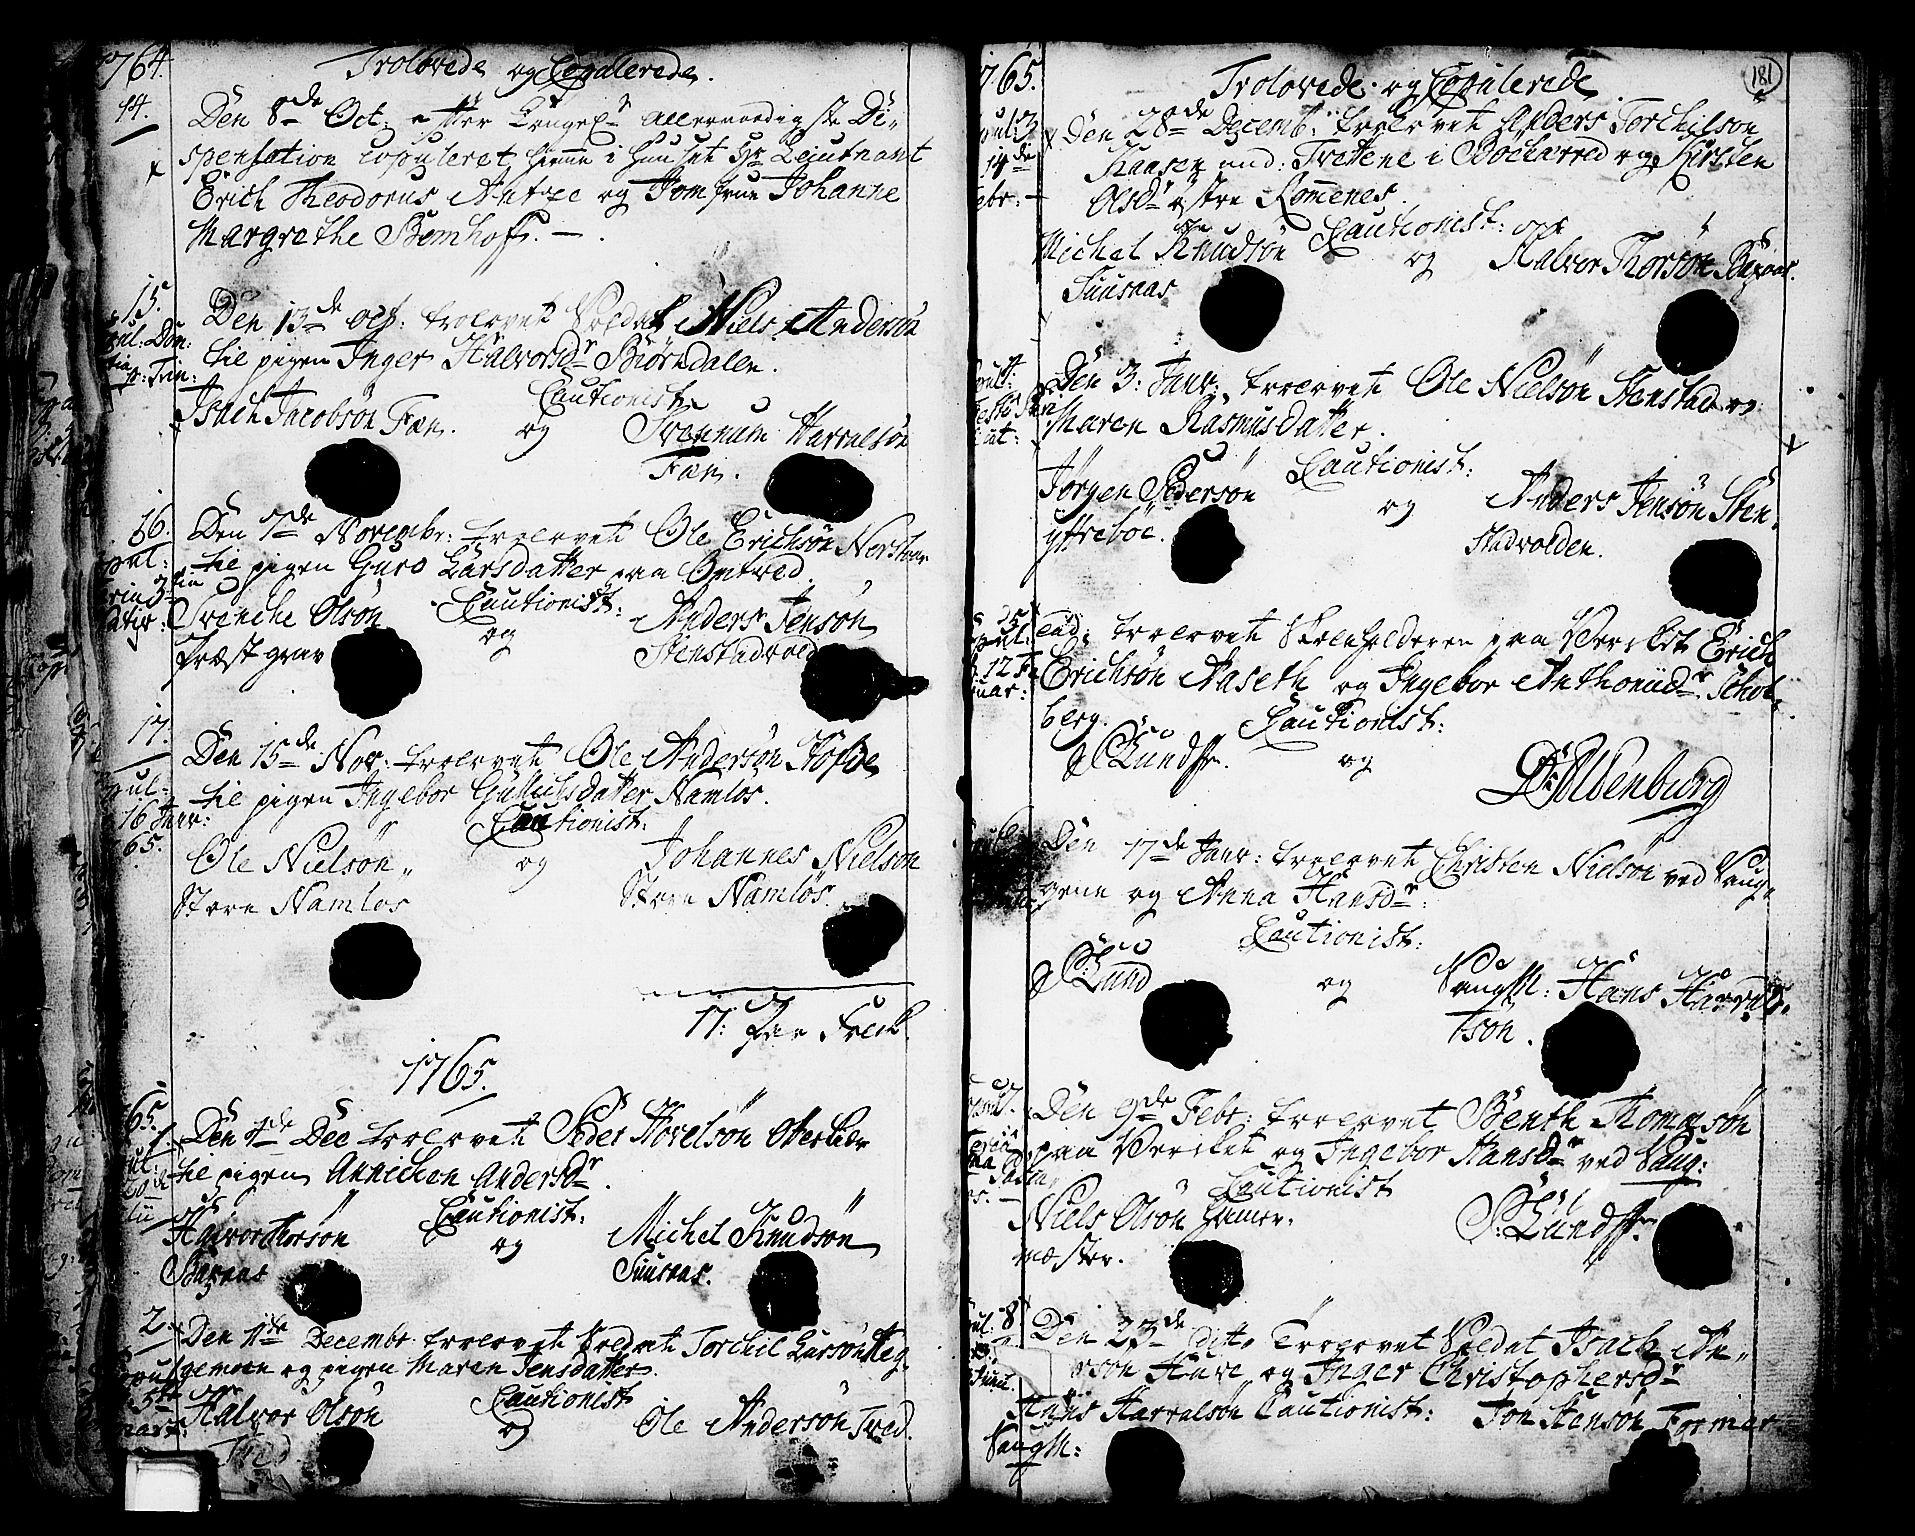 SAKO, Holla kirkebøker, F/Fa/L0001: Ministerialbok nr. 1, 1717-1779, s. 181